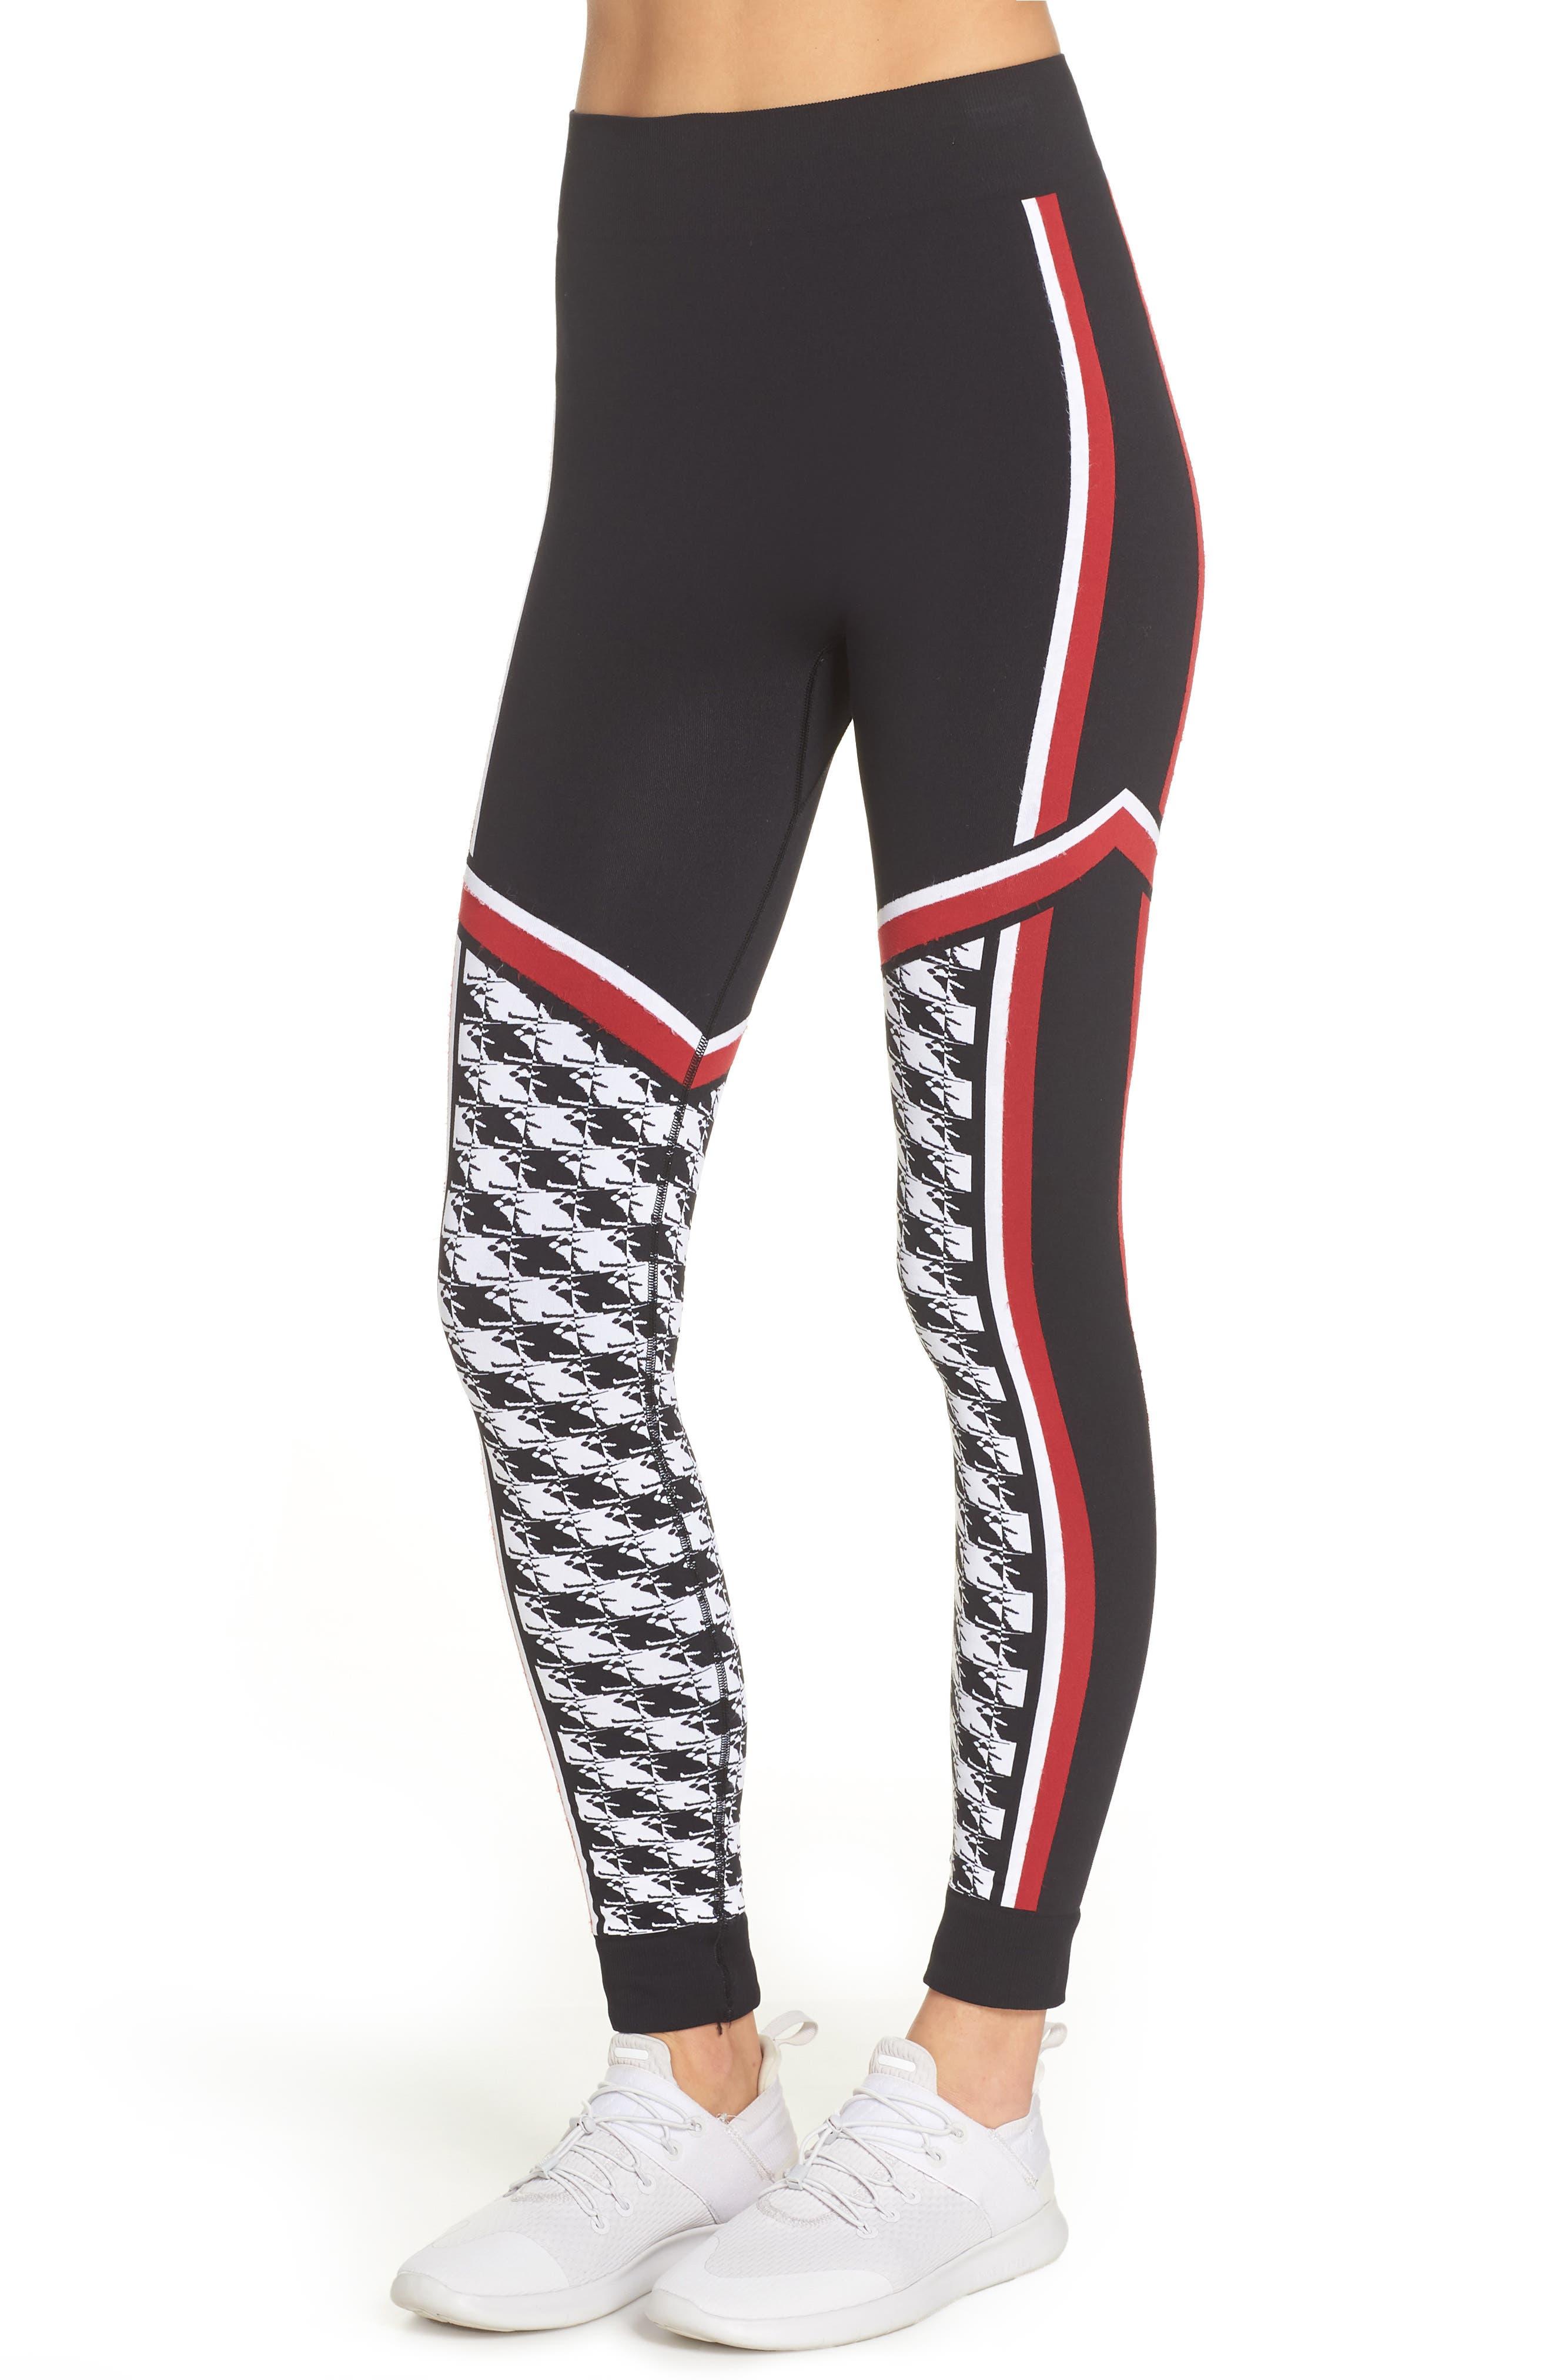 SWEATY BETTY, Ski Seamless Base Layer Leggings, Alternate thumbnail 4, color, 001